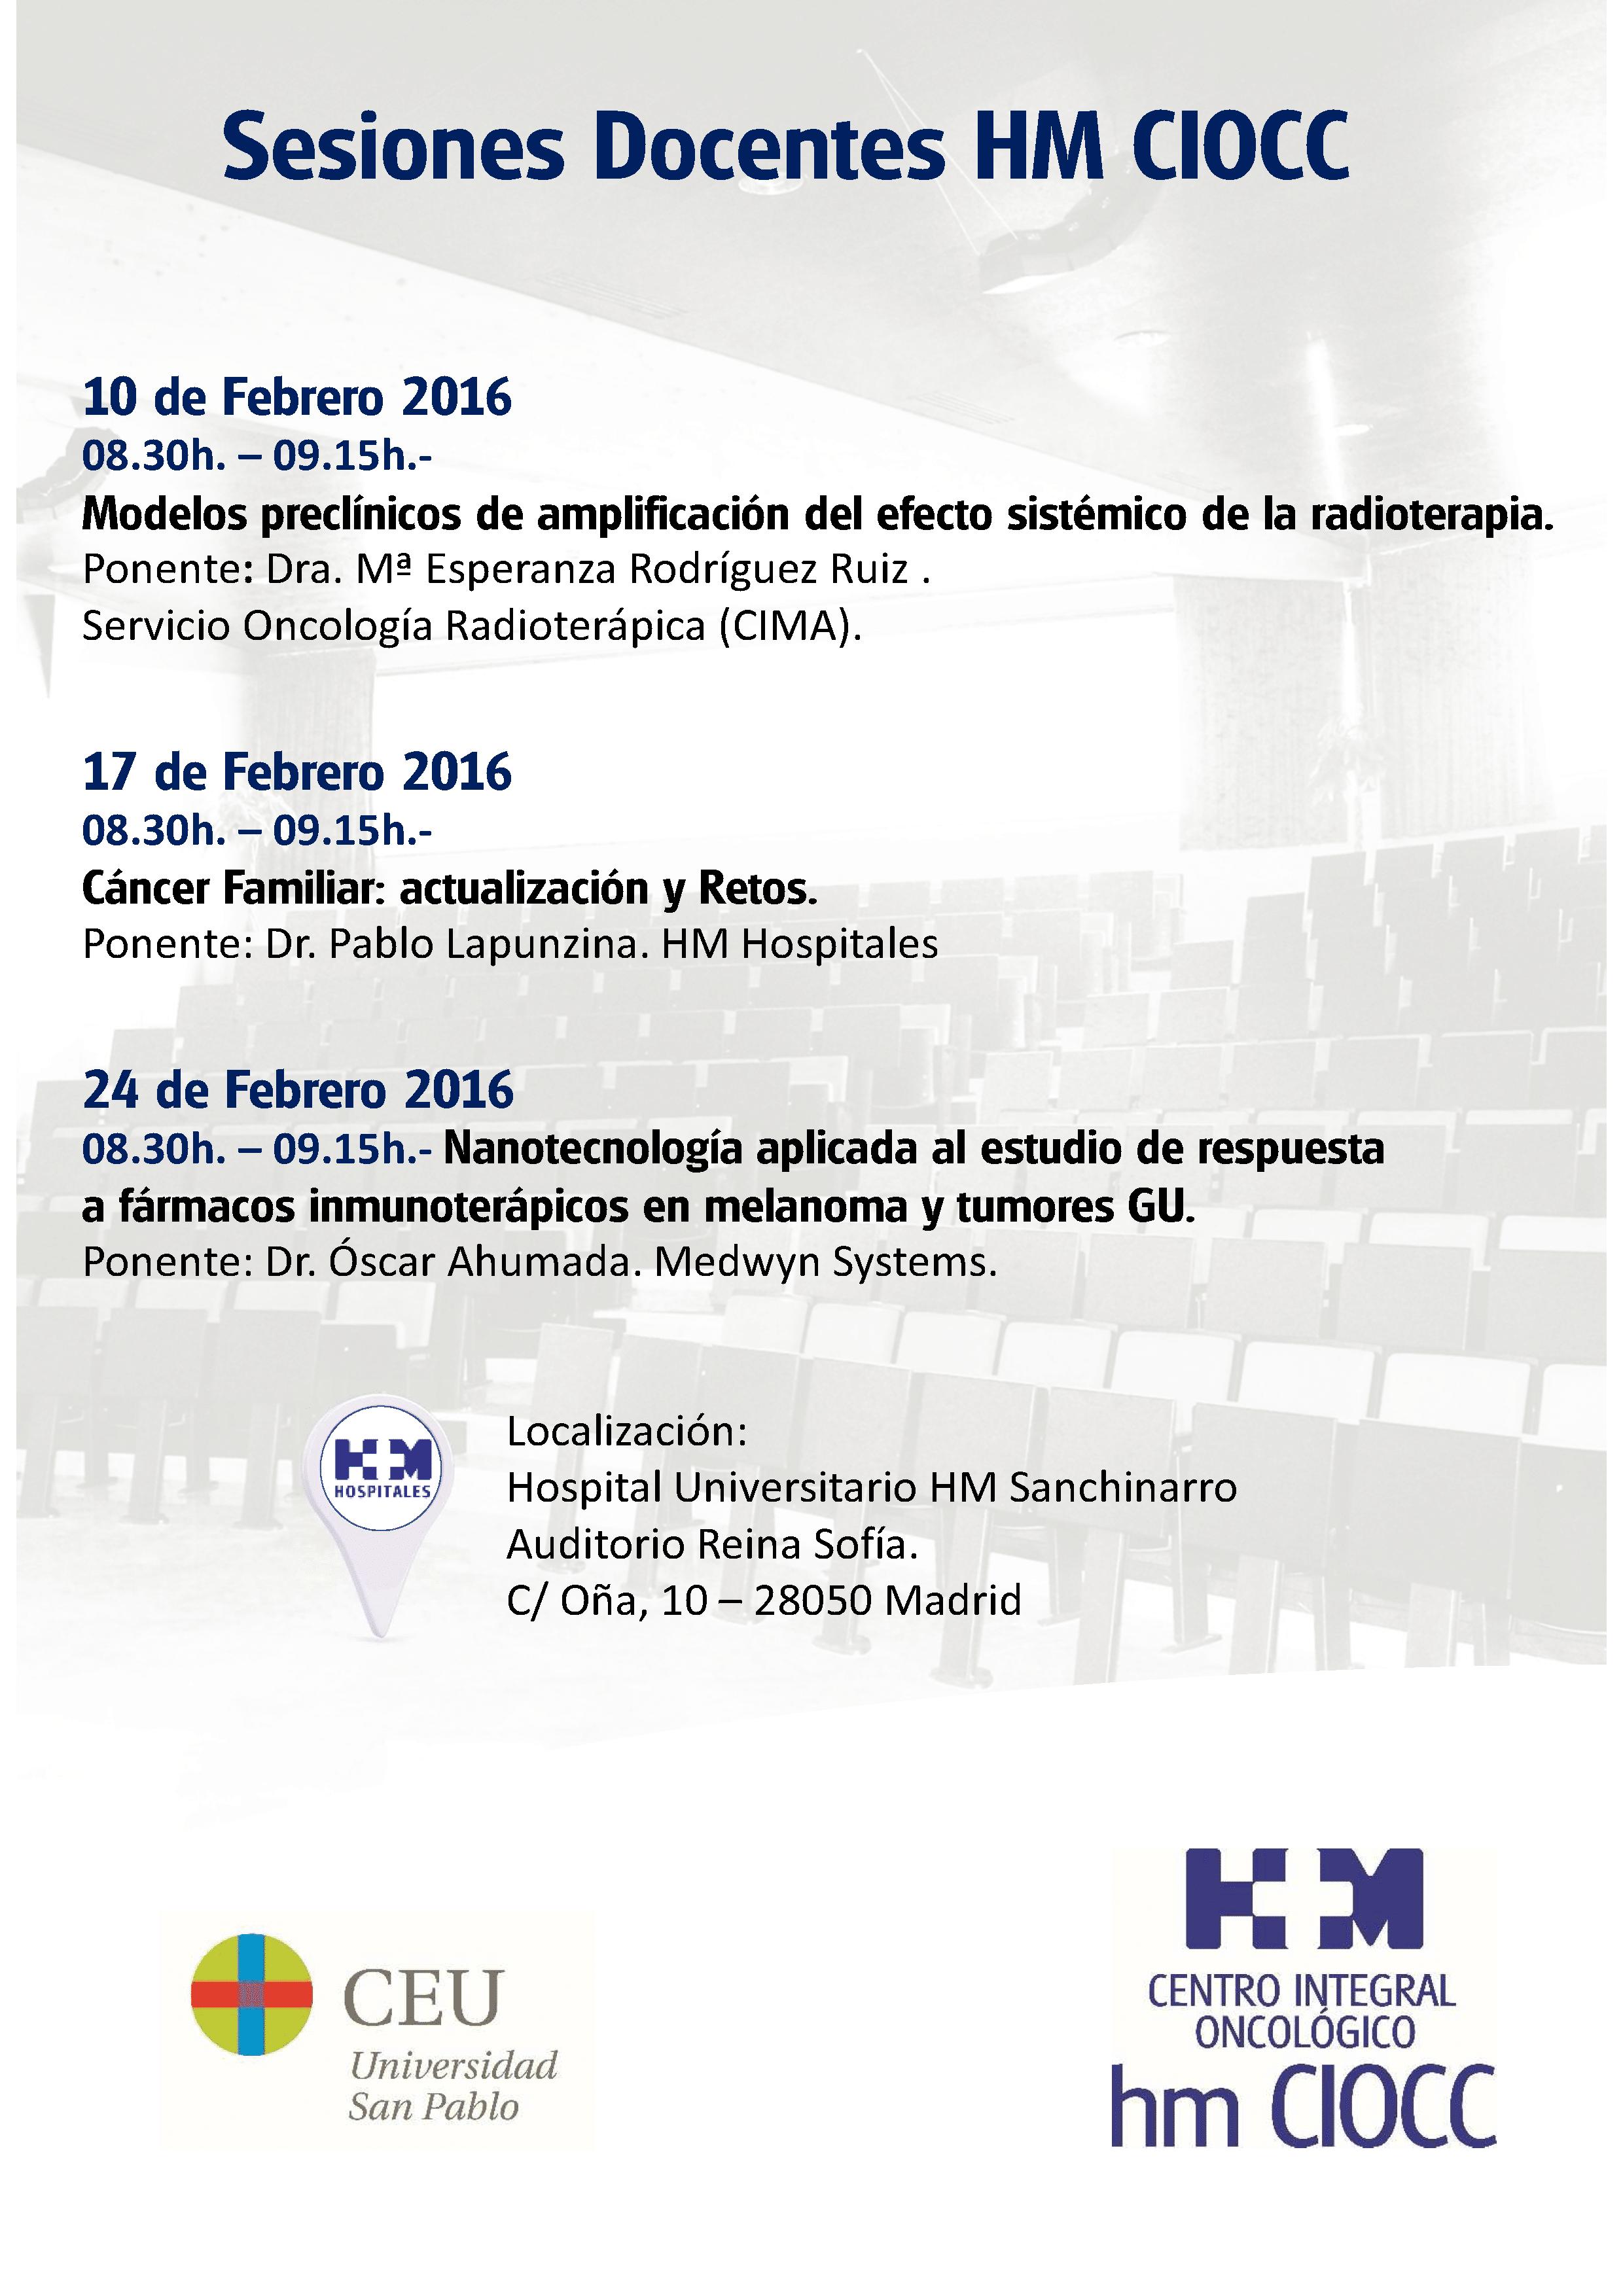 HM CIOCC febrero